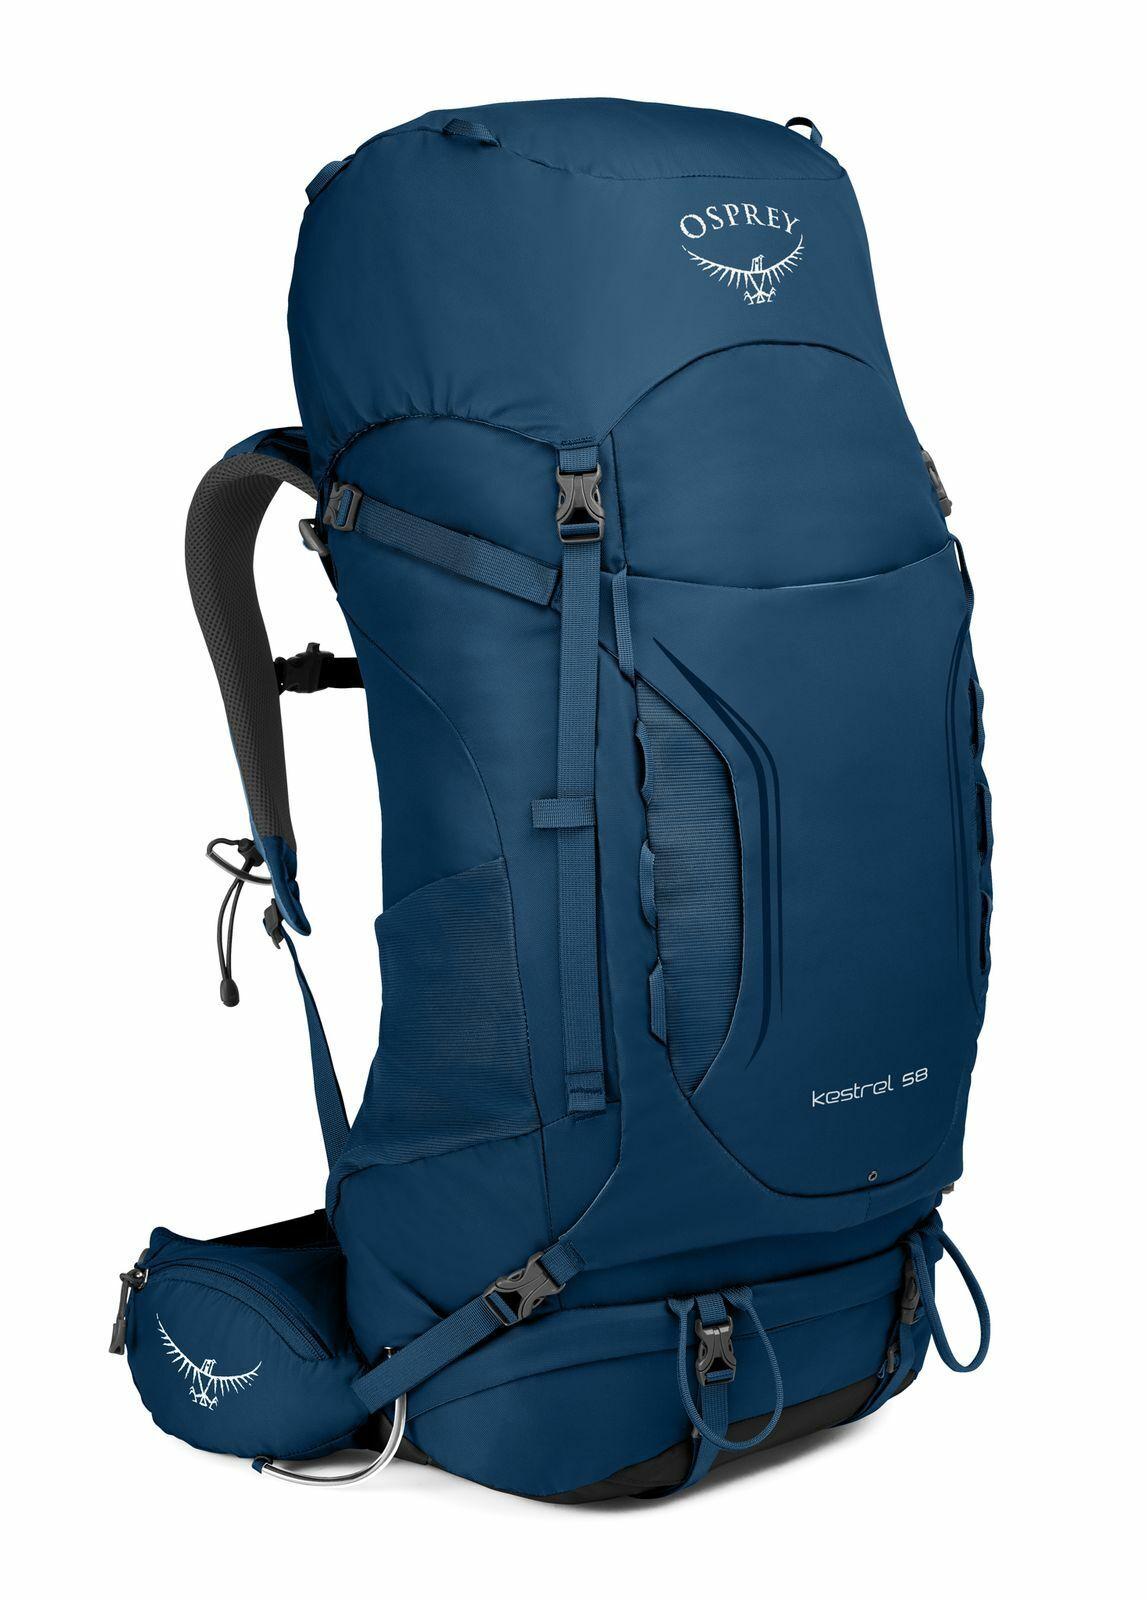 Zaino Osprey Kestrel 58 SM Loch Blu